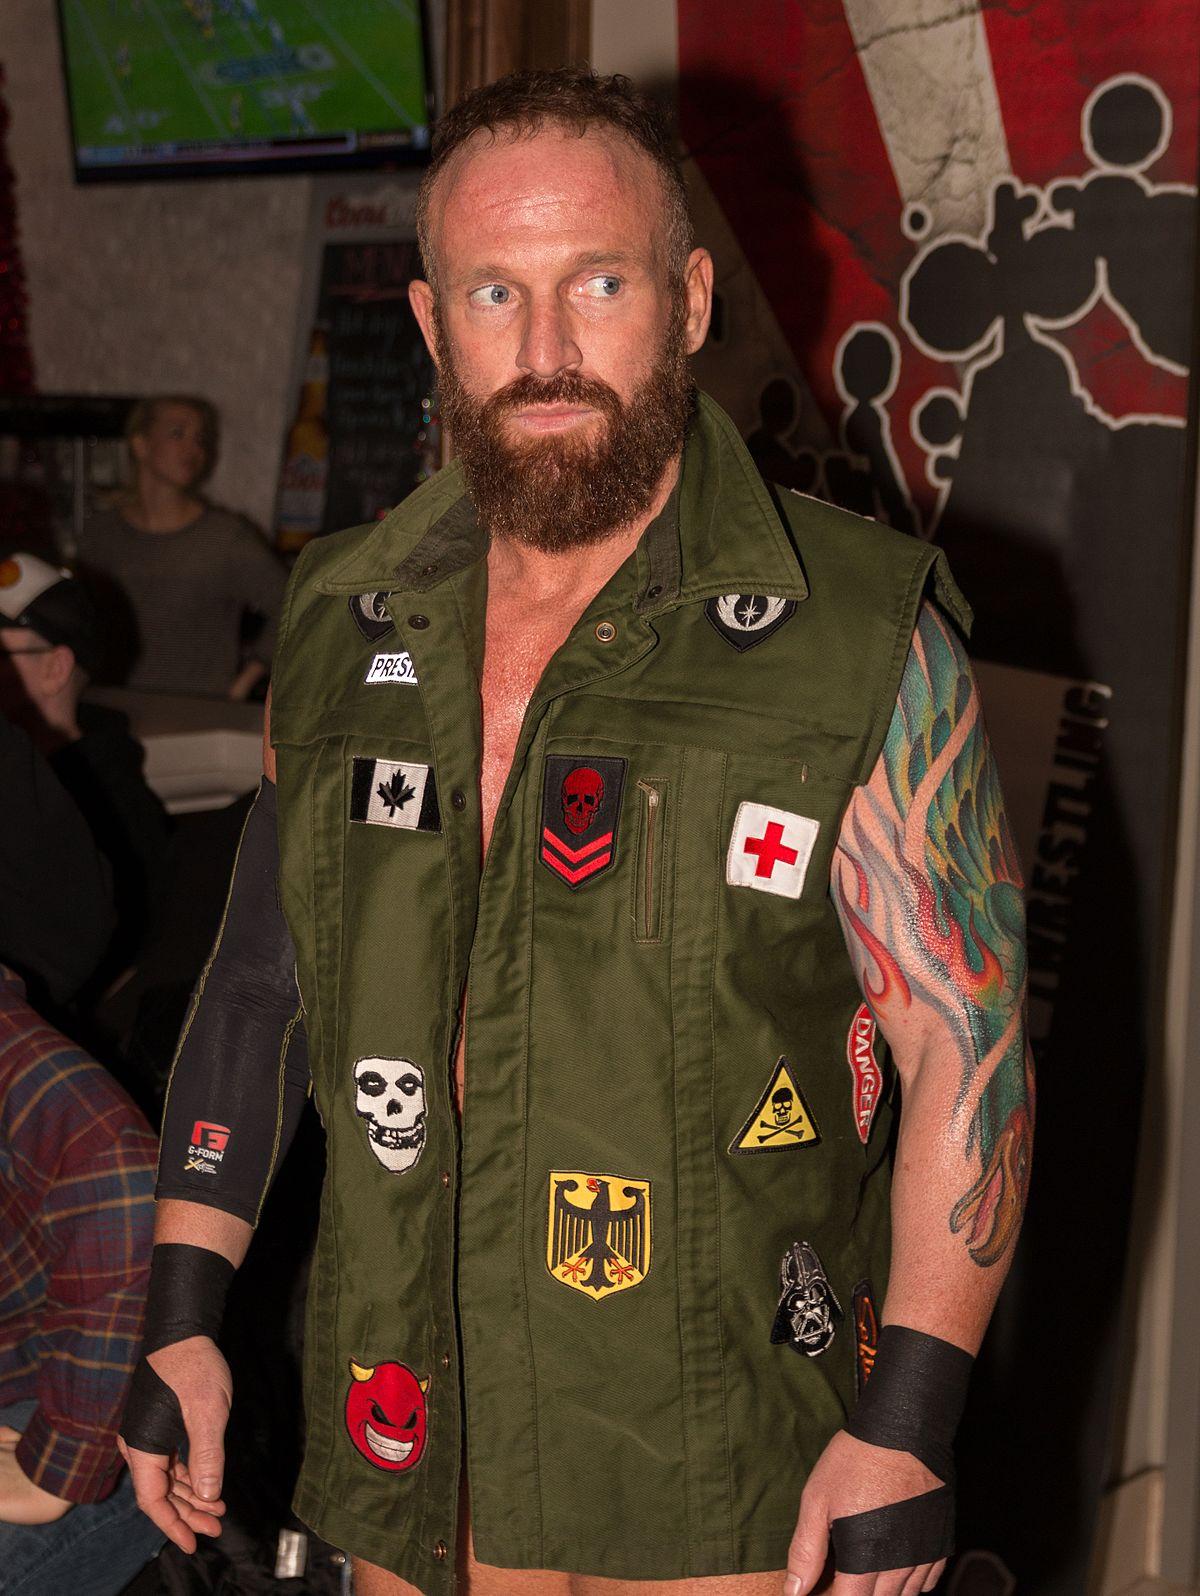 cd49936406 Eric Young (wrestler) - Wikipedia